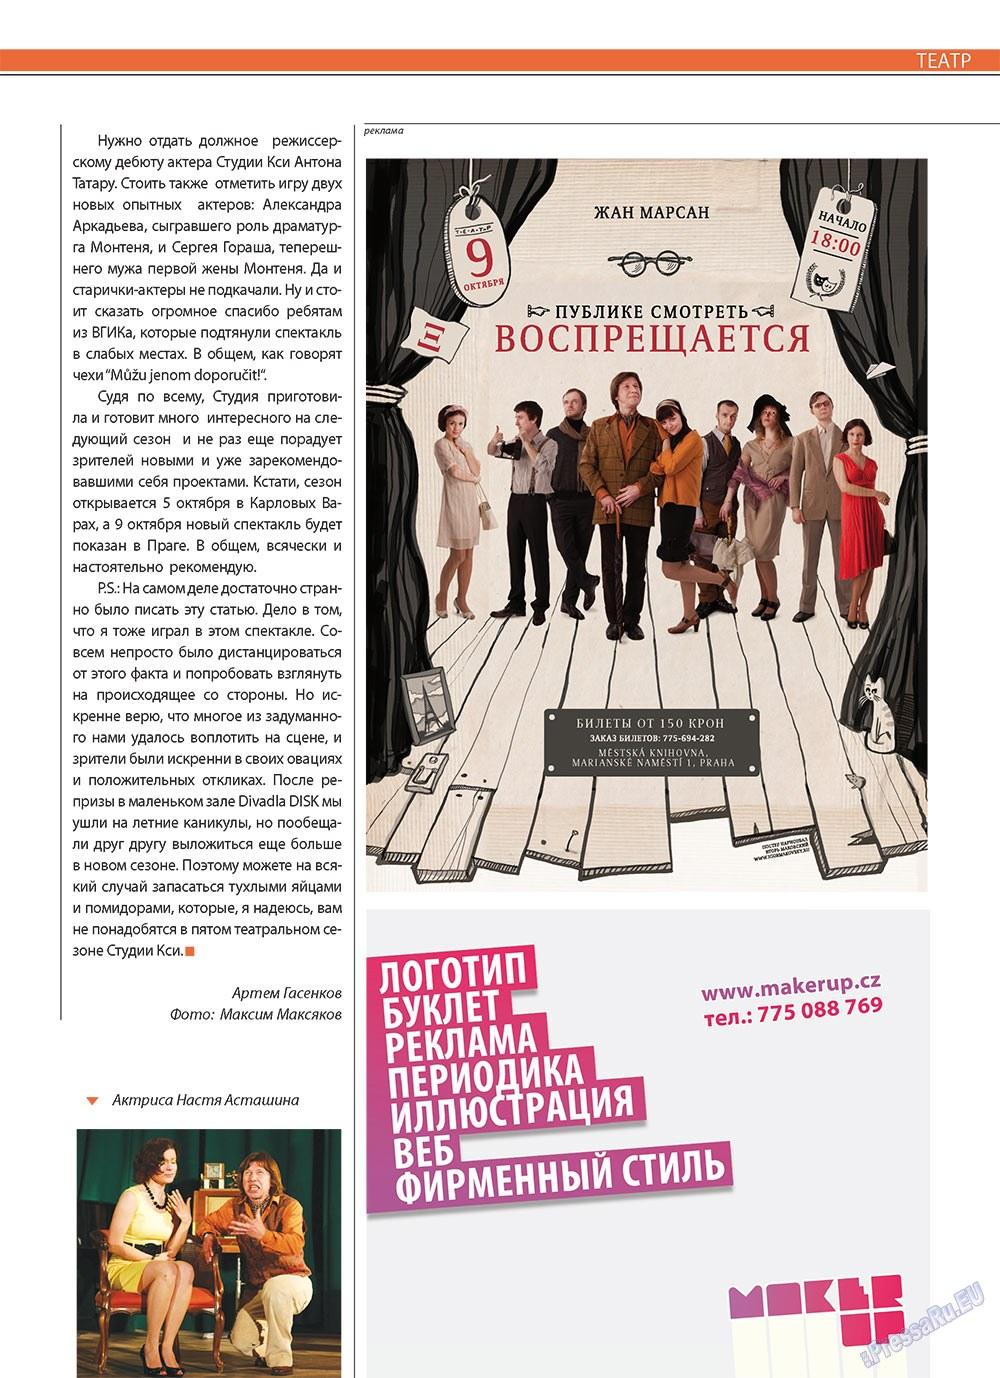 Артек (журнал). 2010 год, номер 4, стр. 19